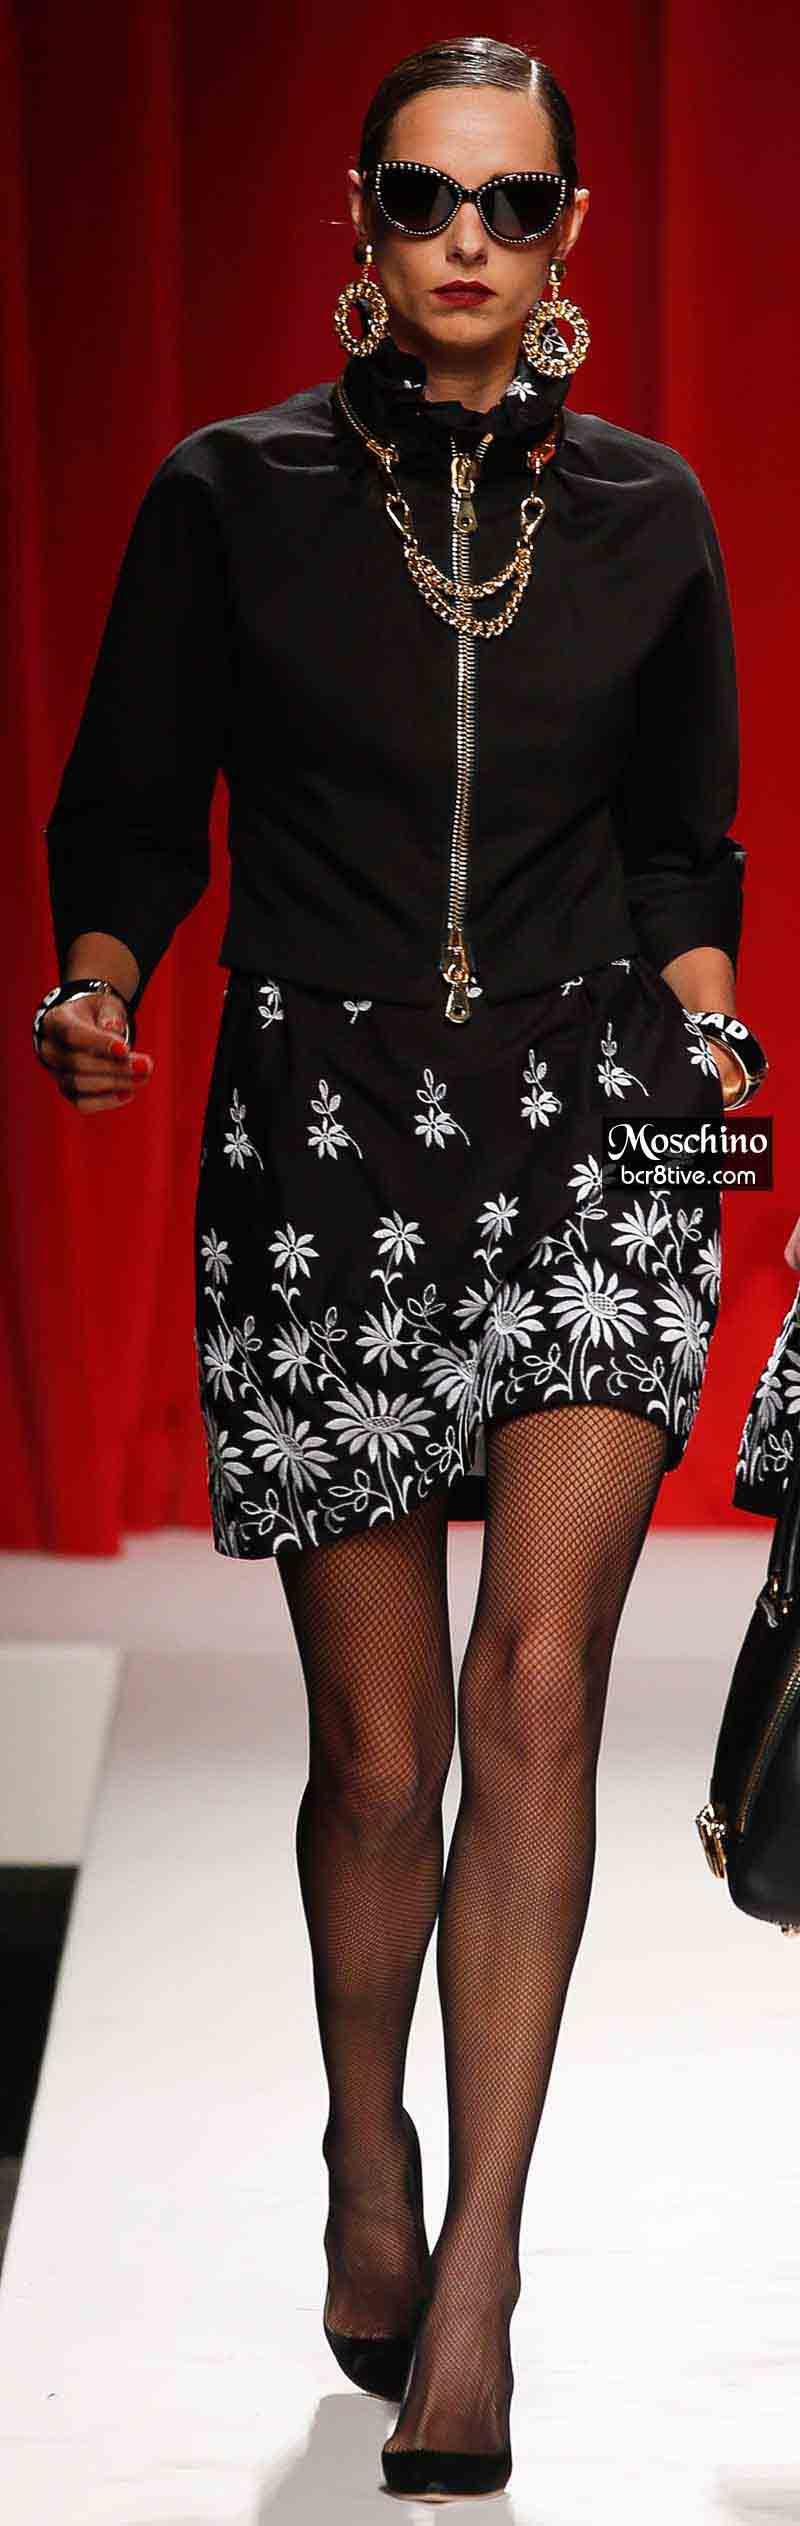 Moschino Spring 2014